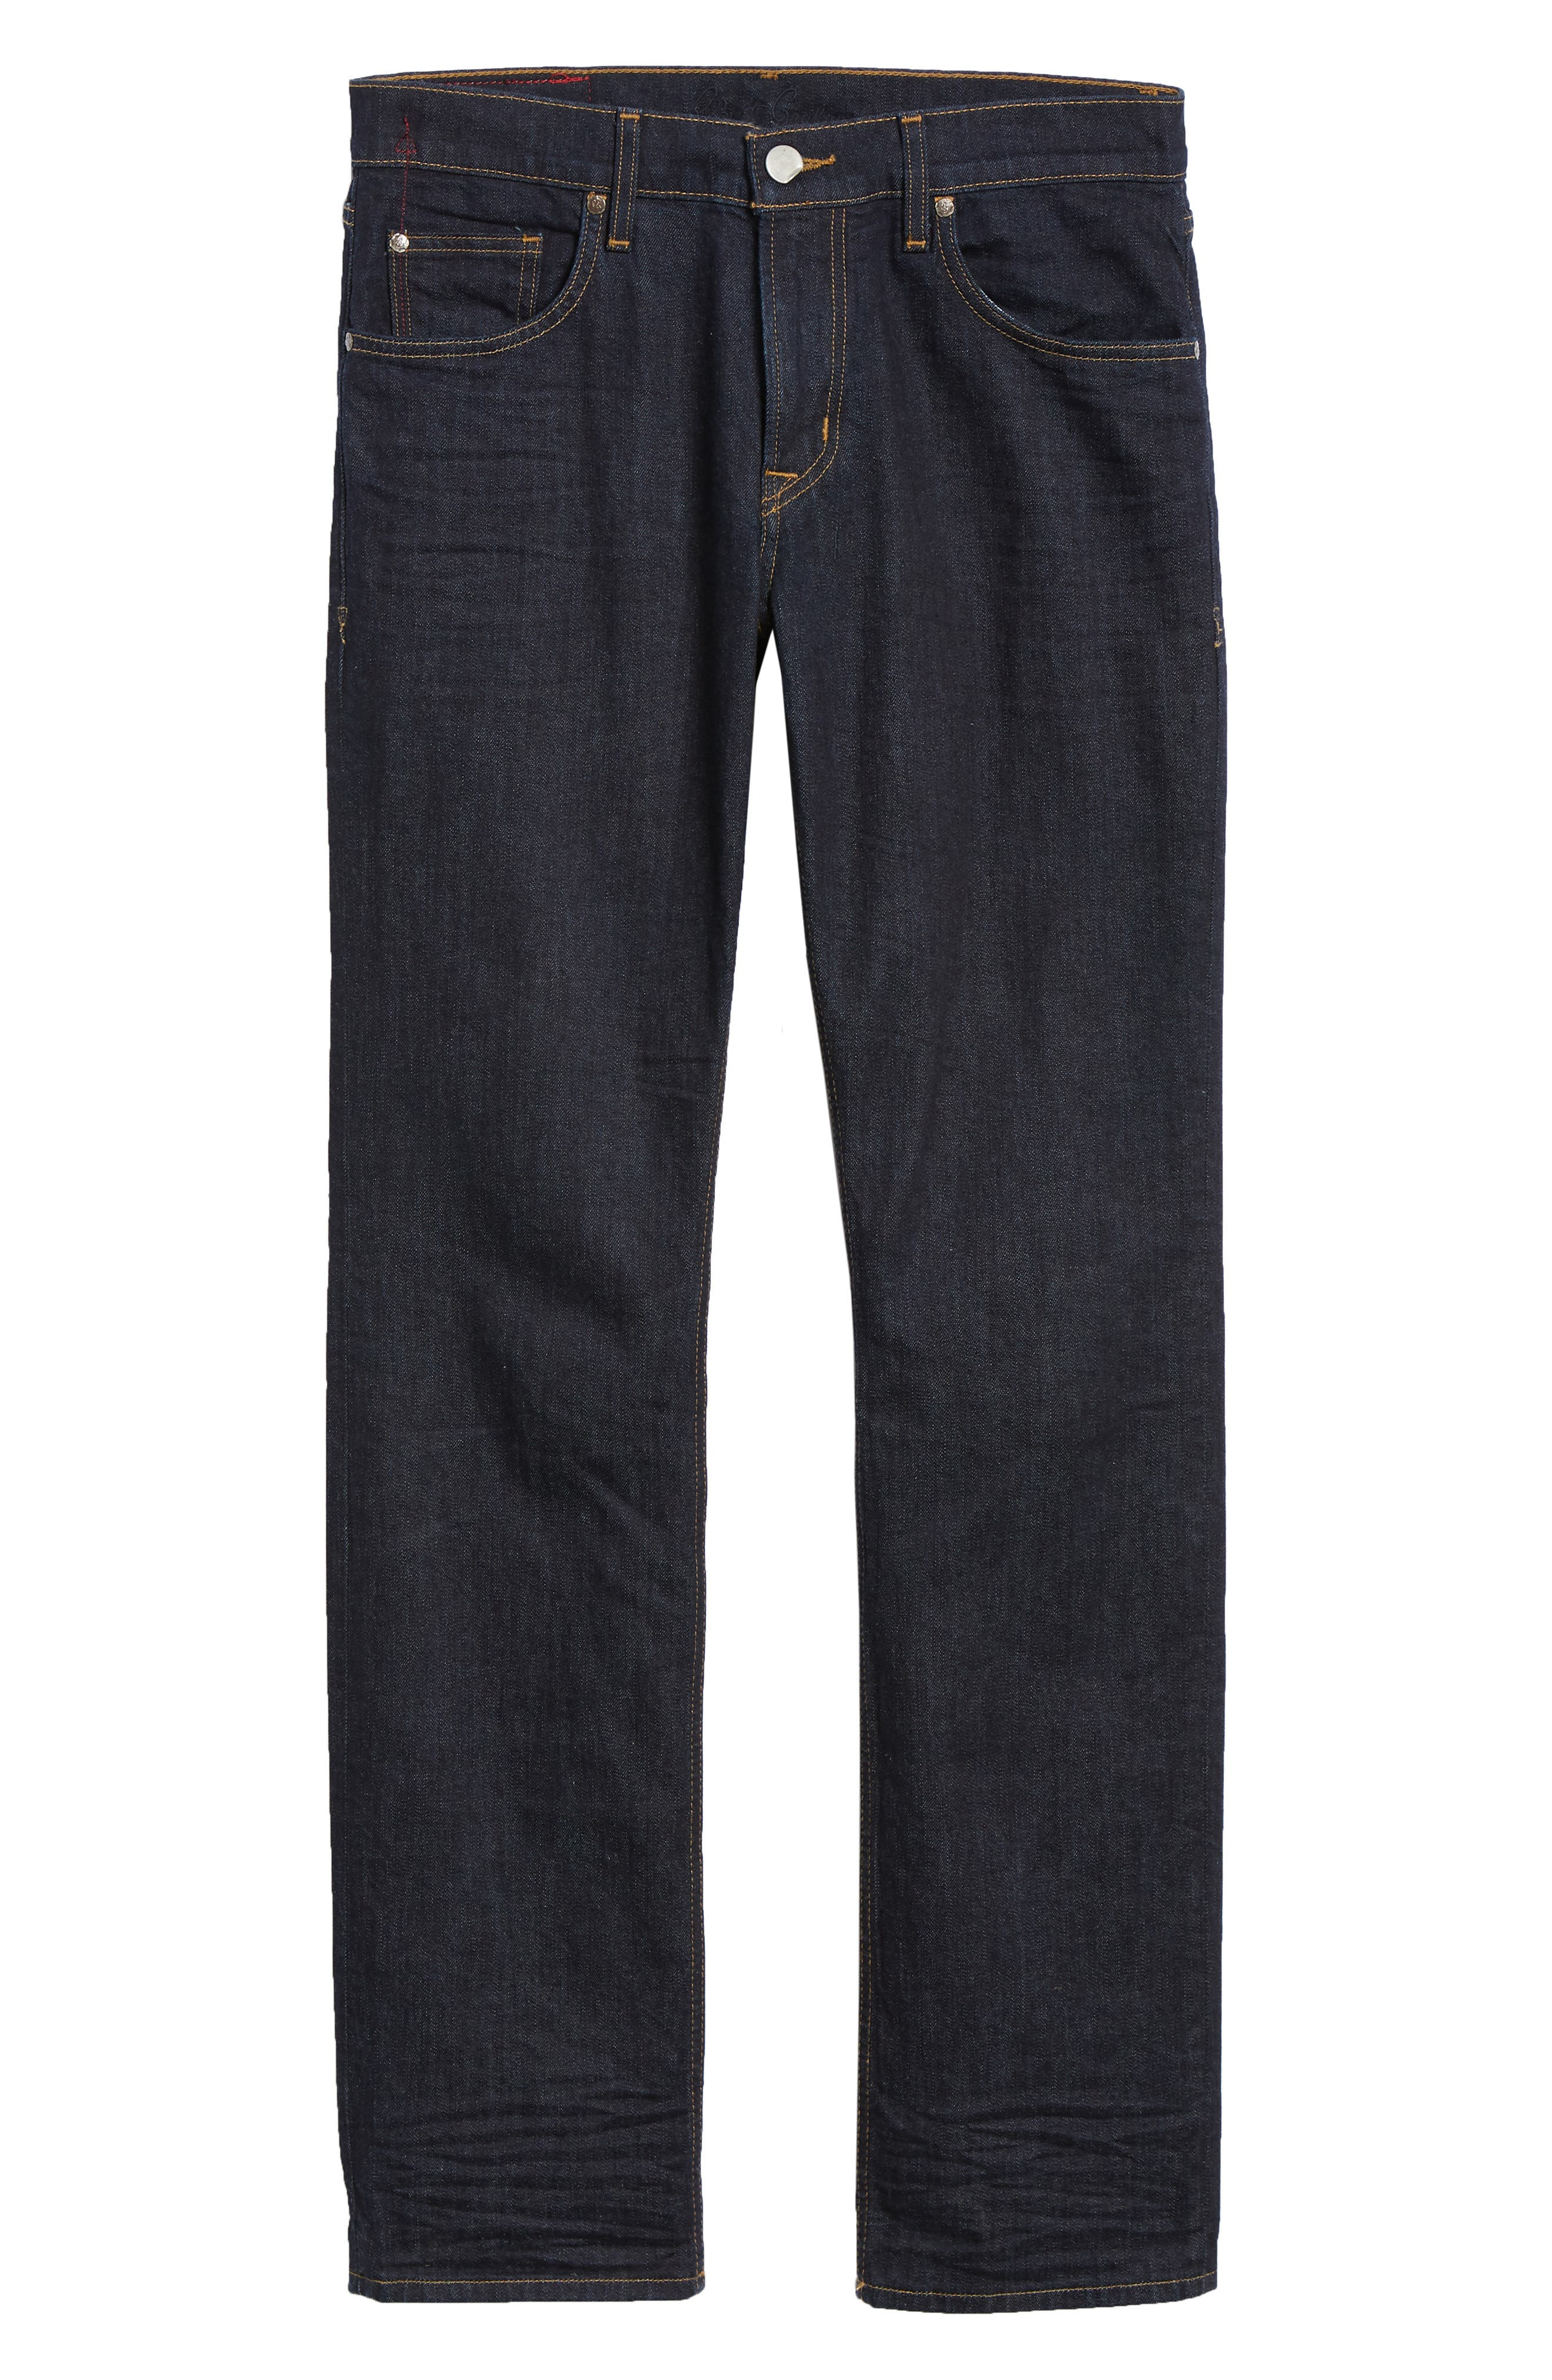 Austen Straight Leg Jeans,                             Alternate thumbnail 6, color,                             INDIGO